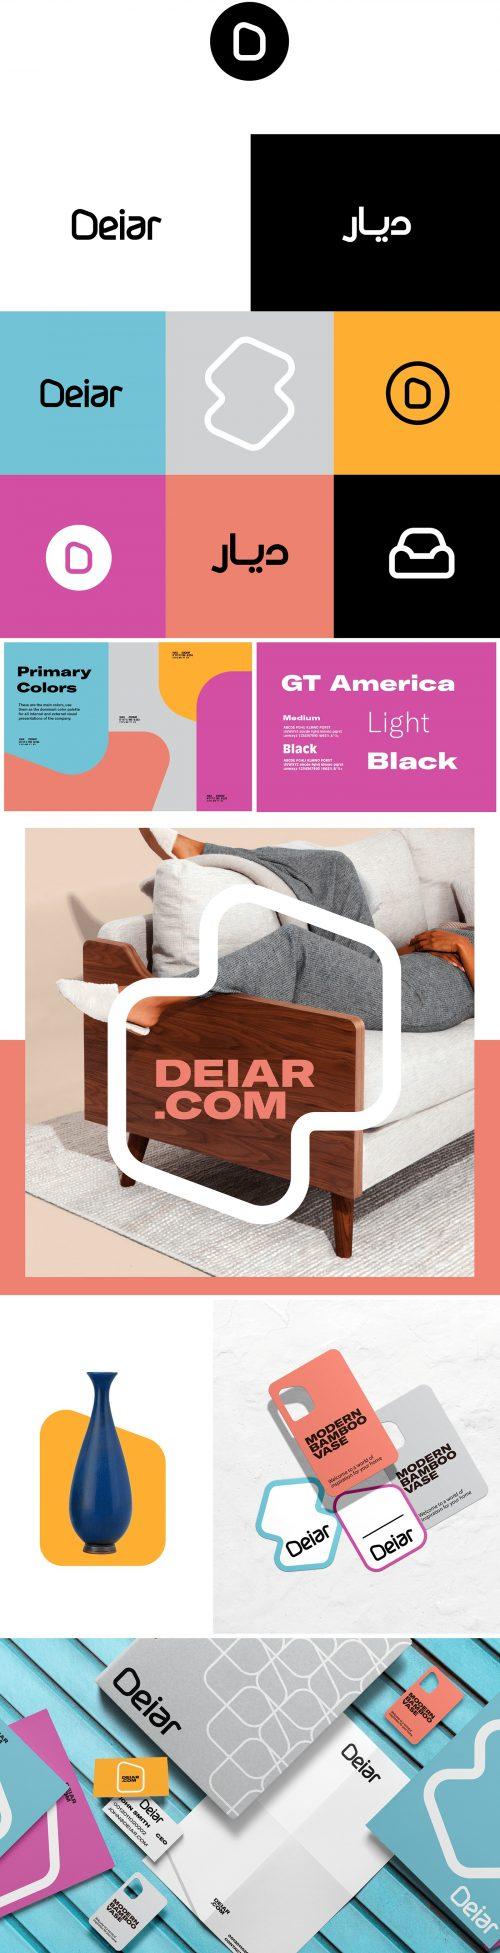 Deiar Home Furniture Interior Design Brand Identity Branding Design